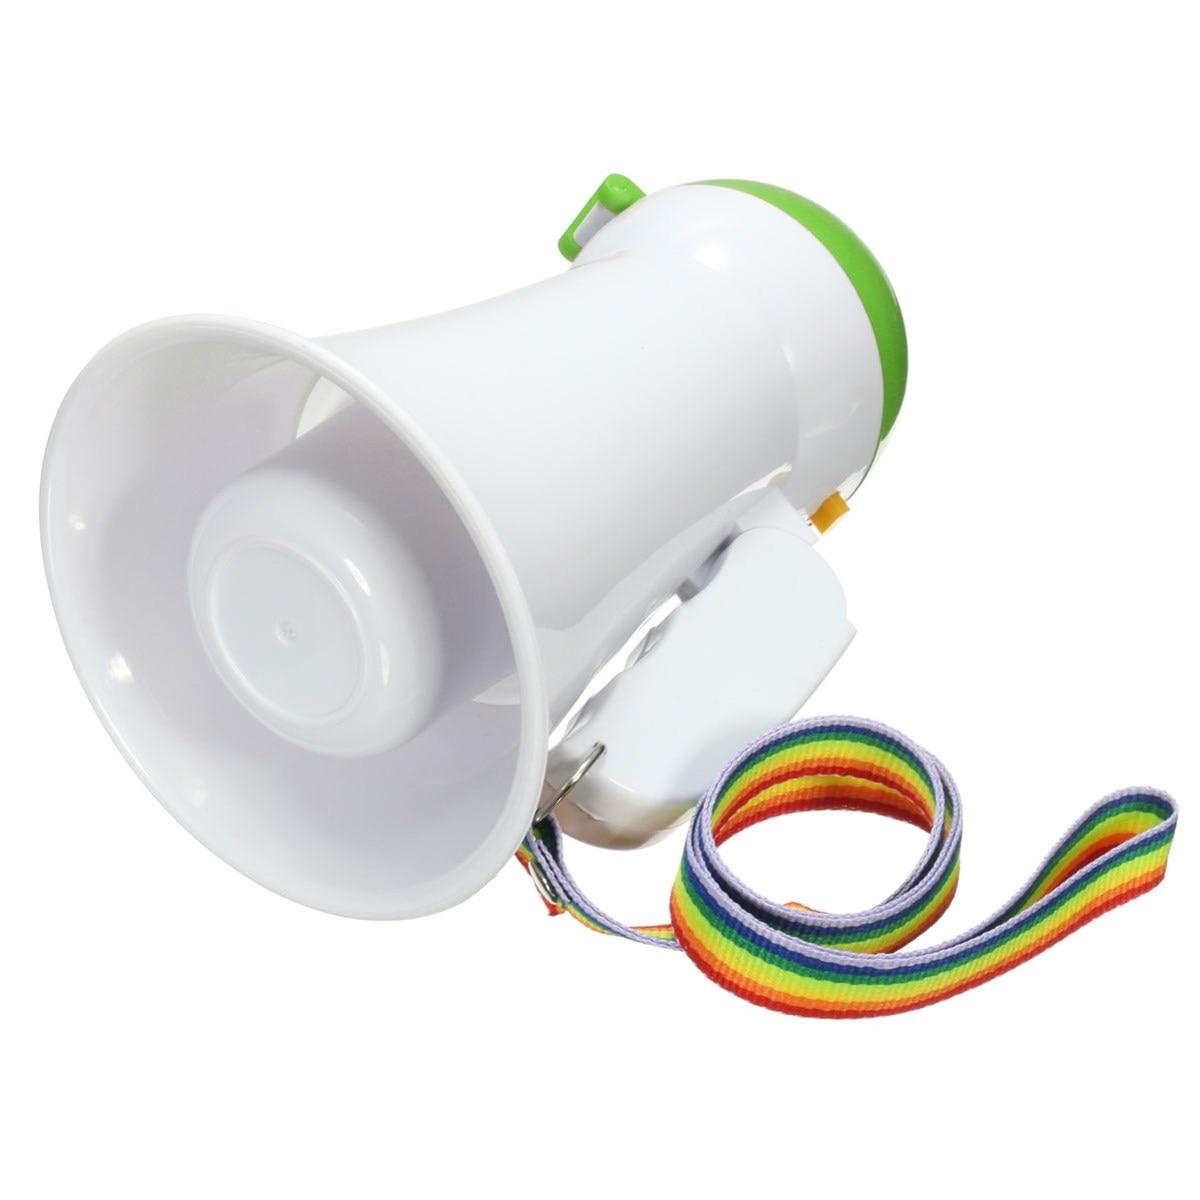 medium resolution of new portable handheld megaphone foldable 5w loud speaker bull horn voice amplifer in microphones from